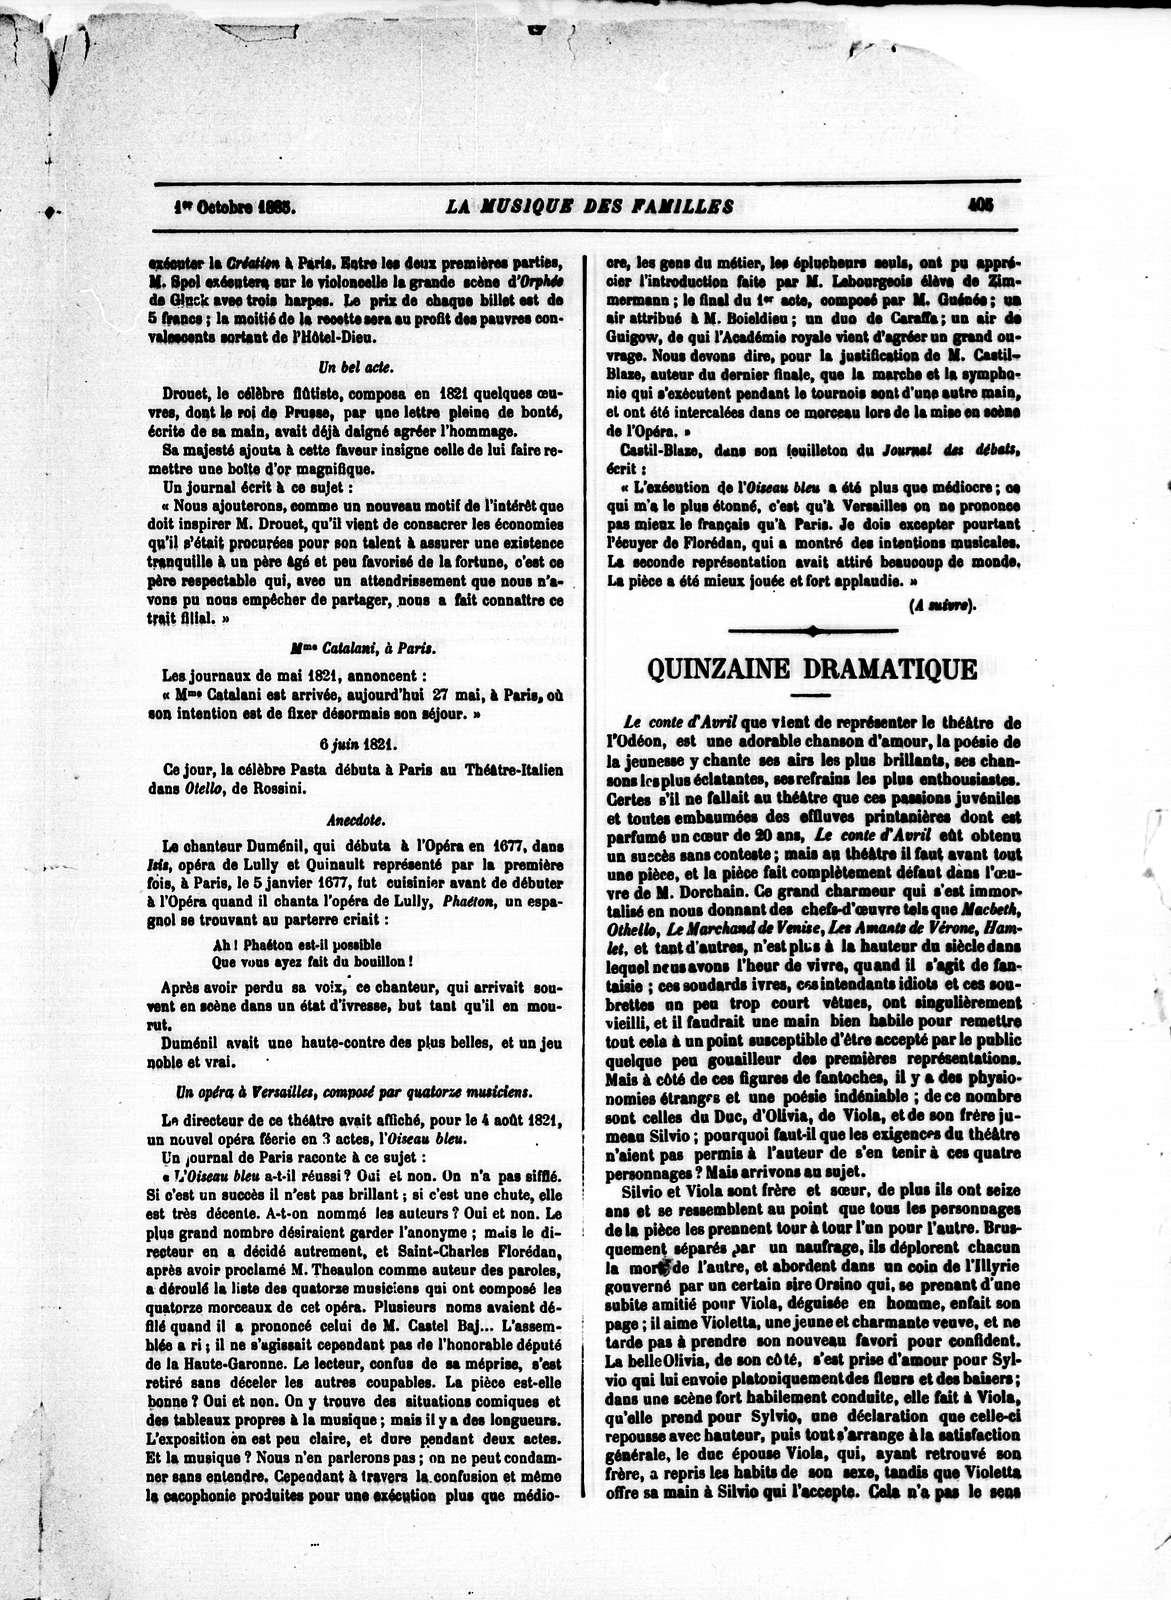 La Musique populaire, Vol. 4, no. 207